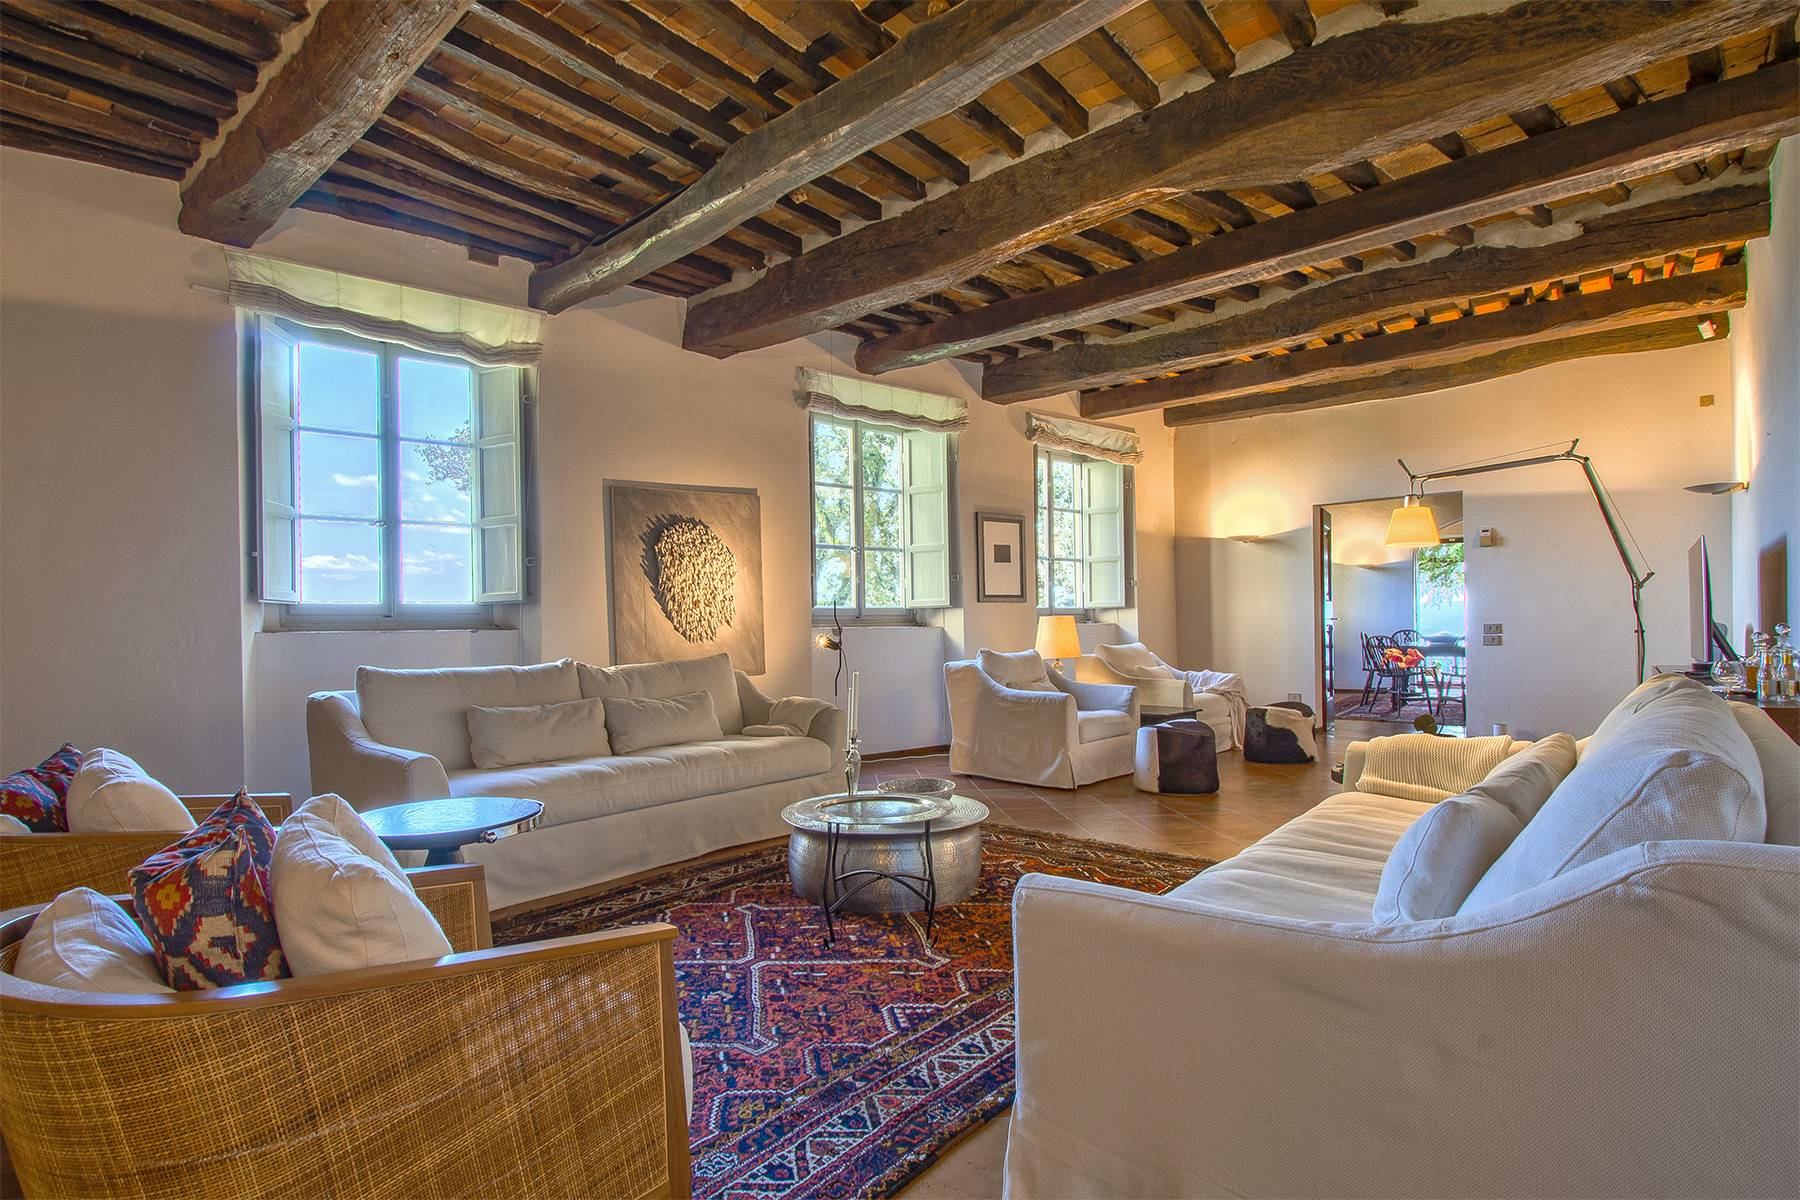 Villa in Vendita a Capannori: 5 locali, 380 mq - Foto 7